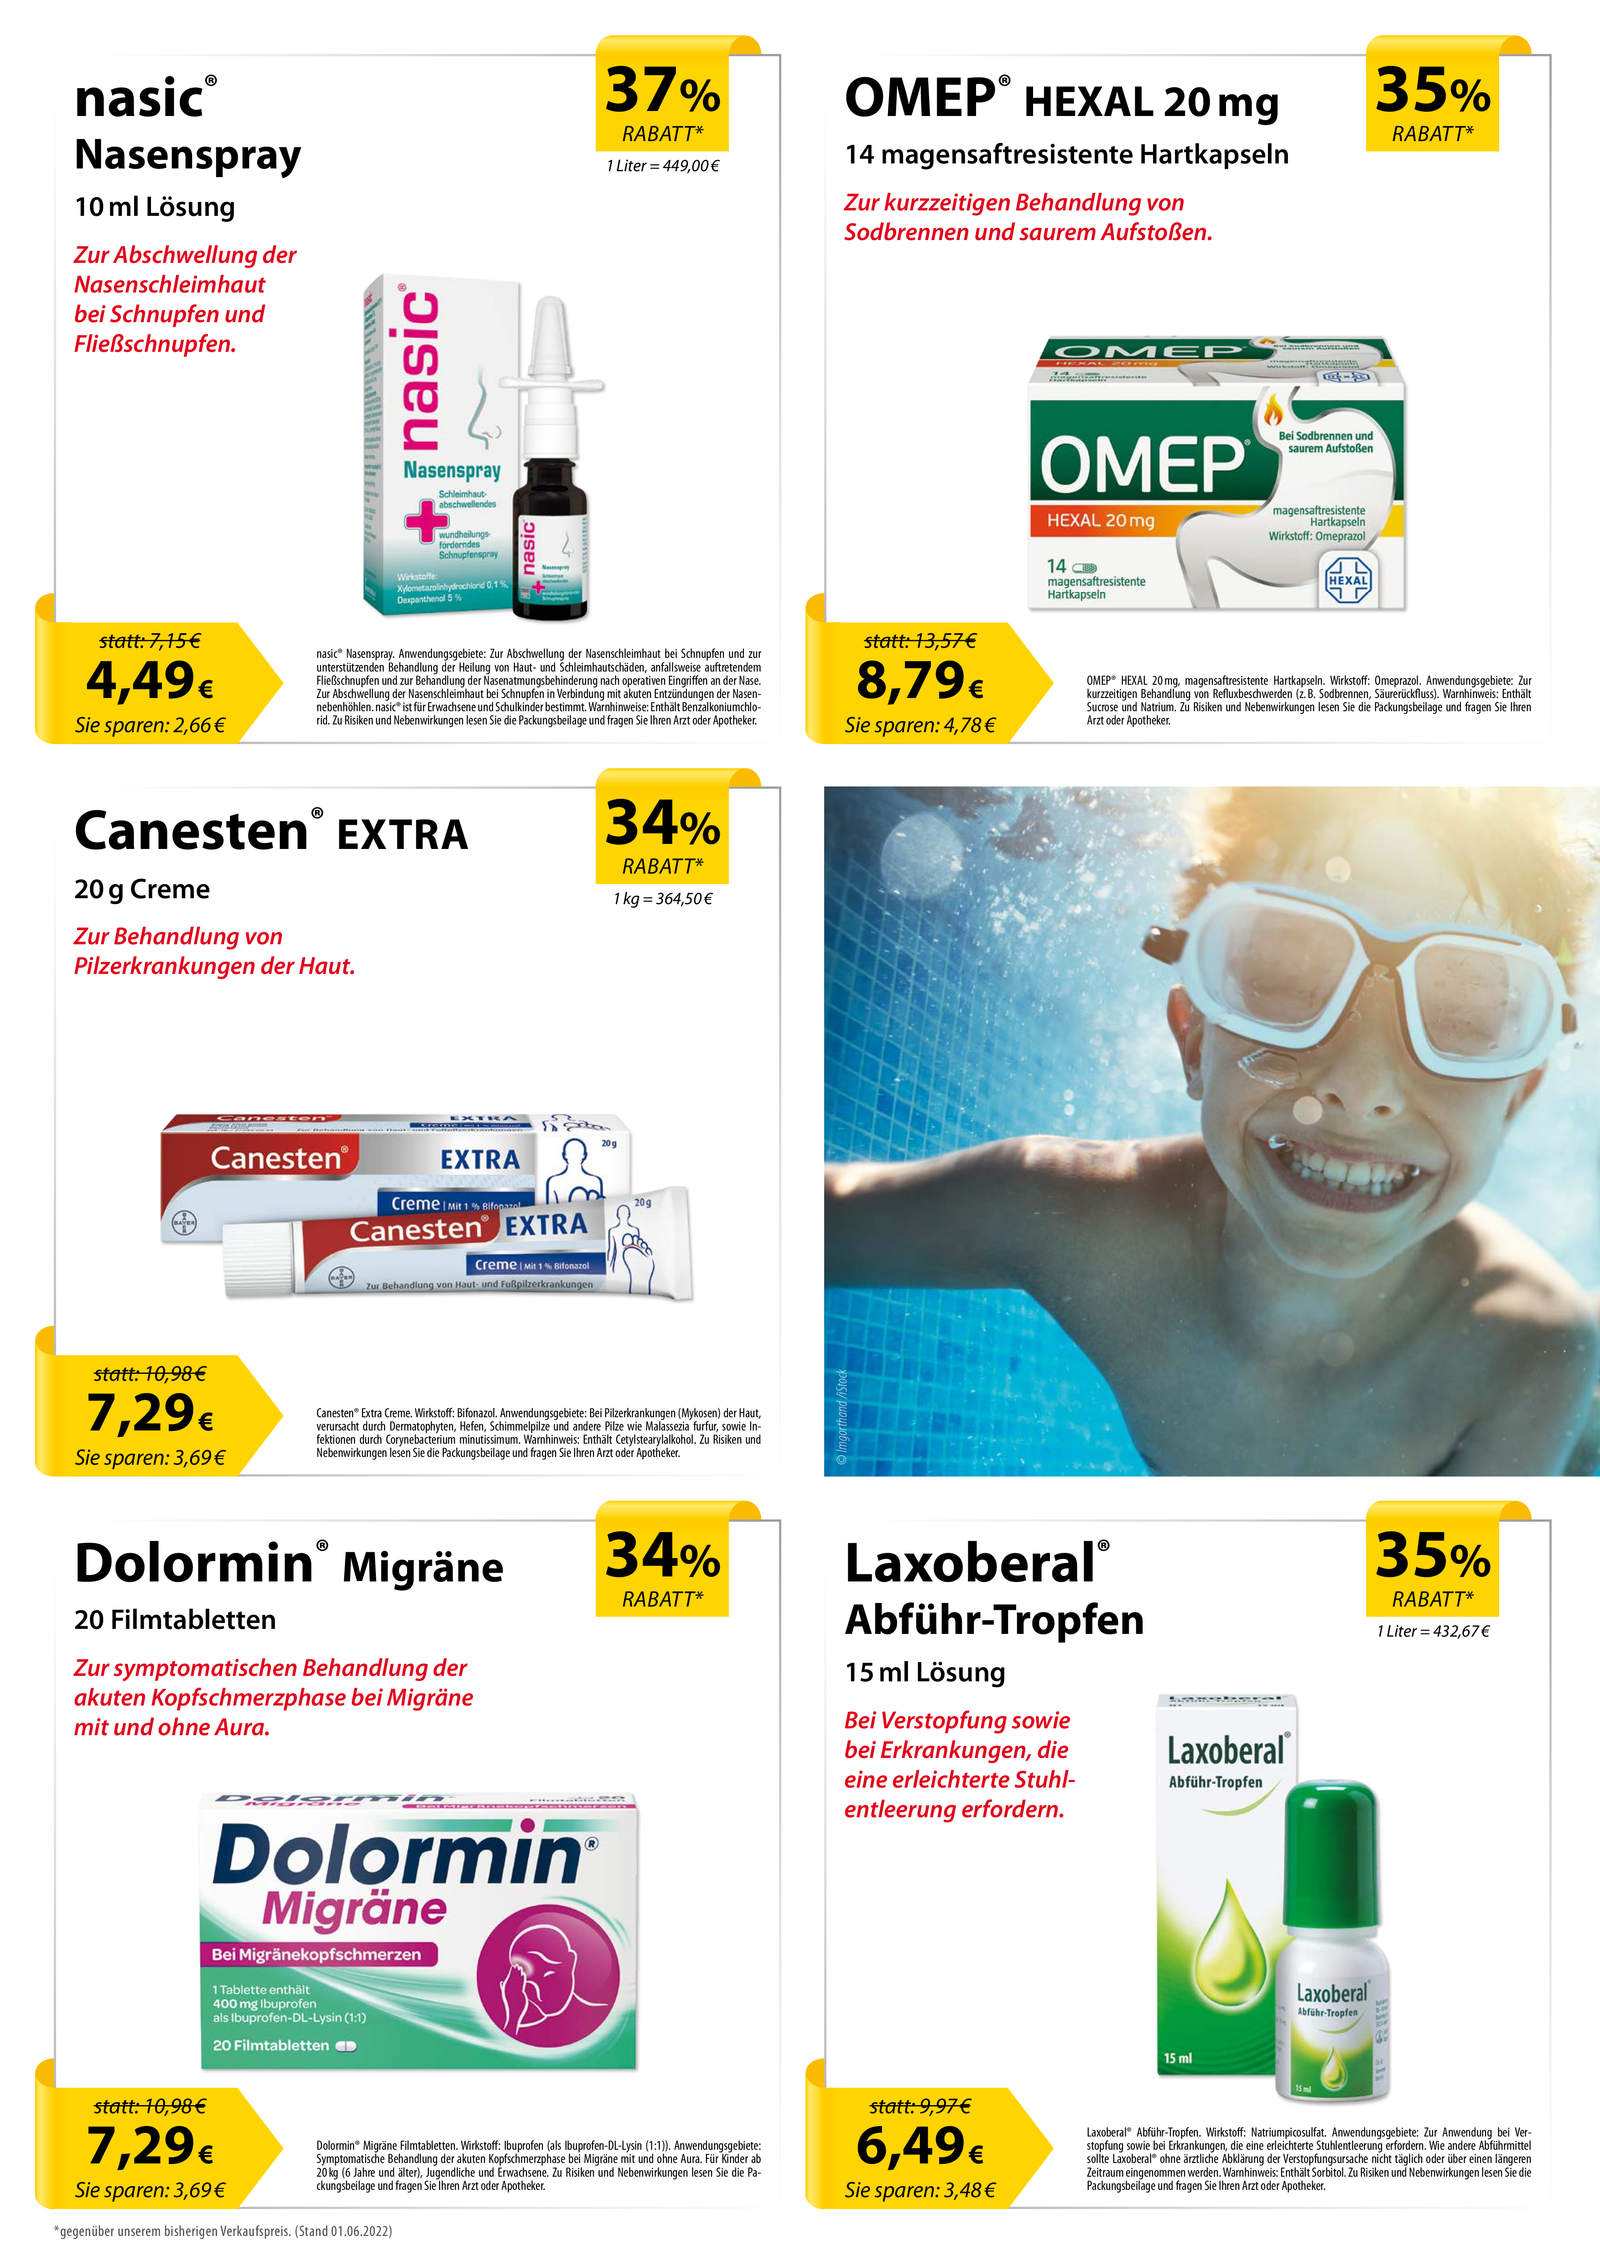 https://mein-uploads.apocdn.net/1028/leaflets/1028_flyer-Seite2.png